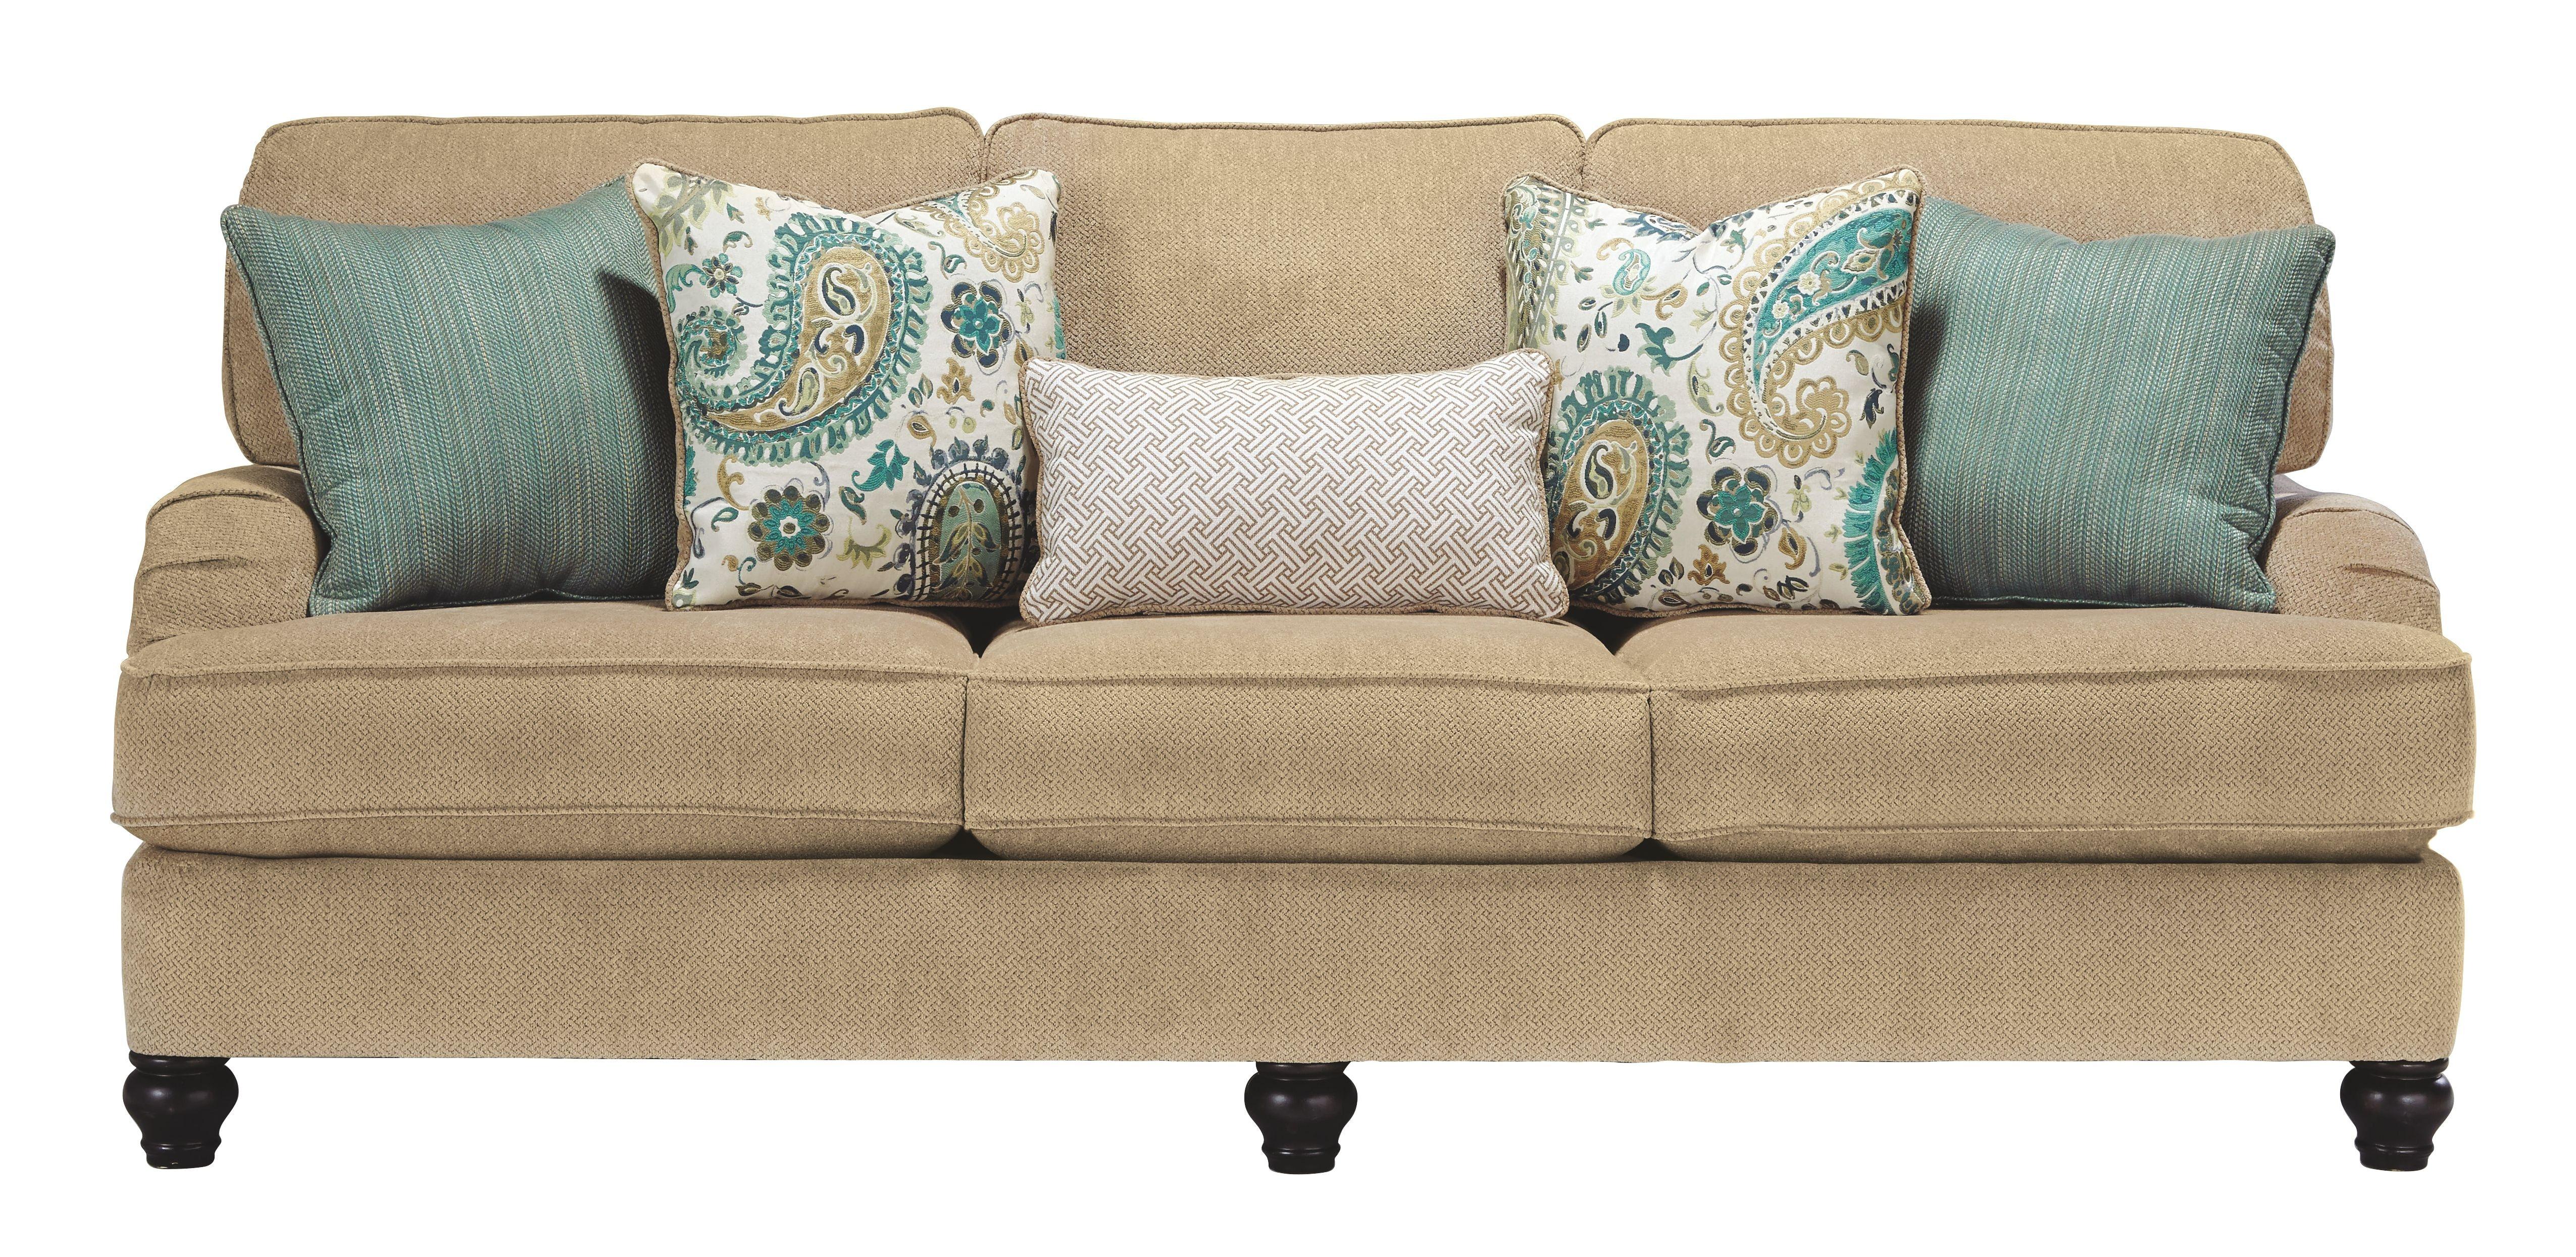 Signature Design By Ashley Living Room Sofa 5810038   Giorgi Brothers    South San Francisco, CA